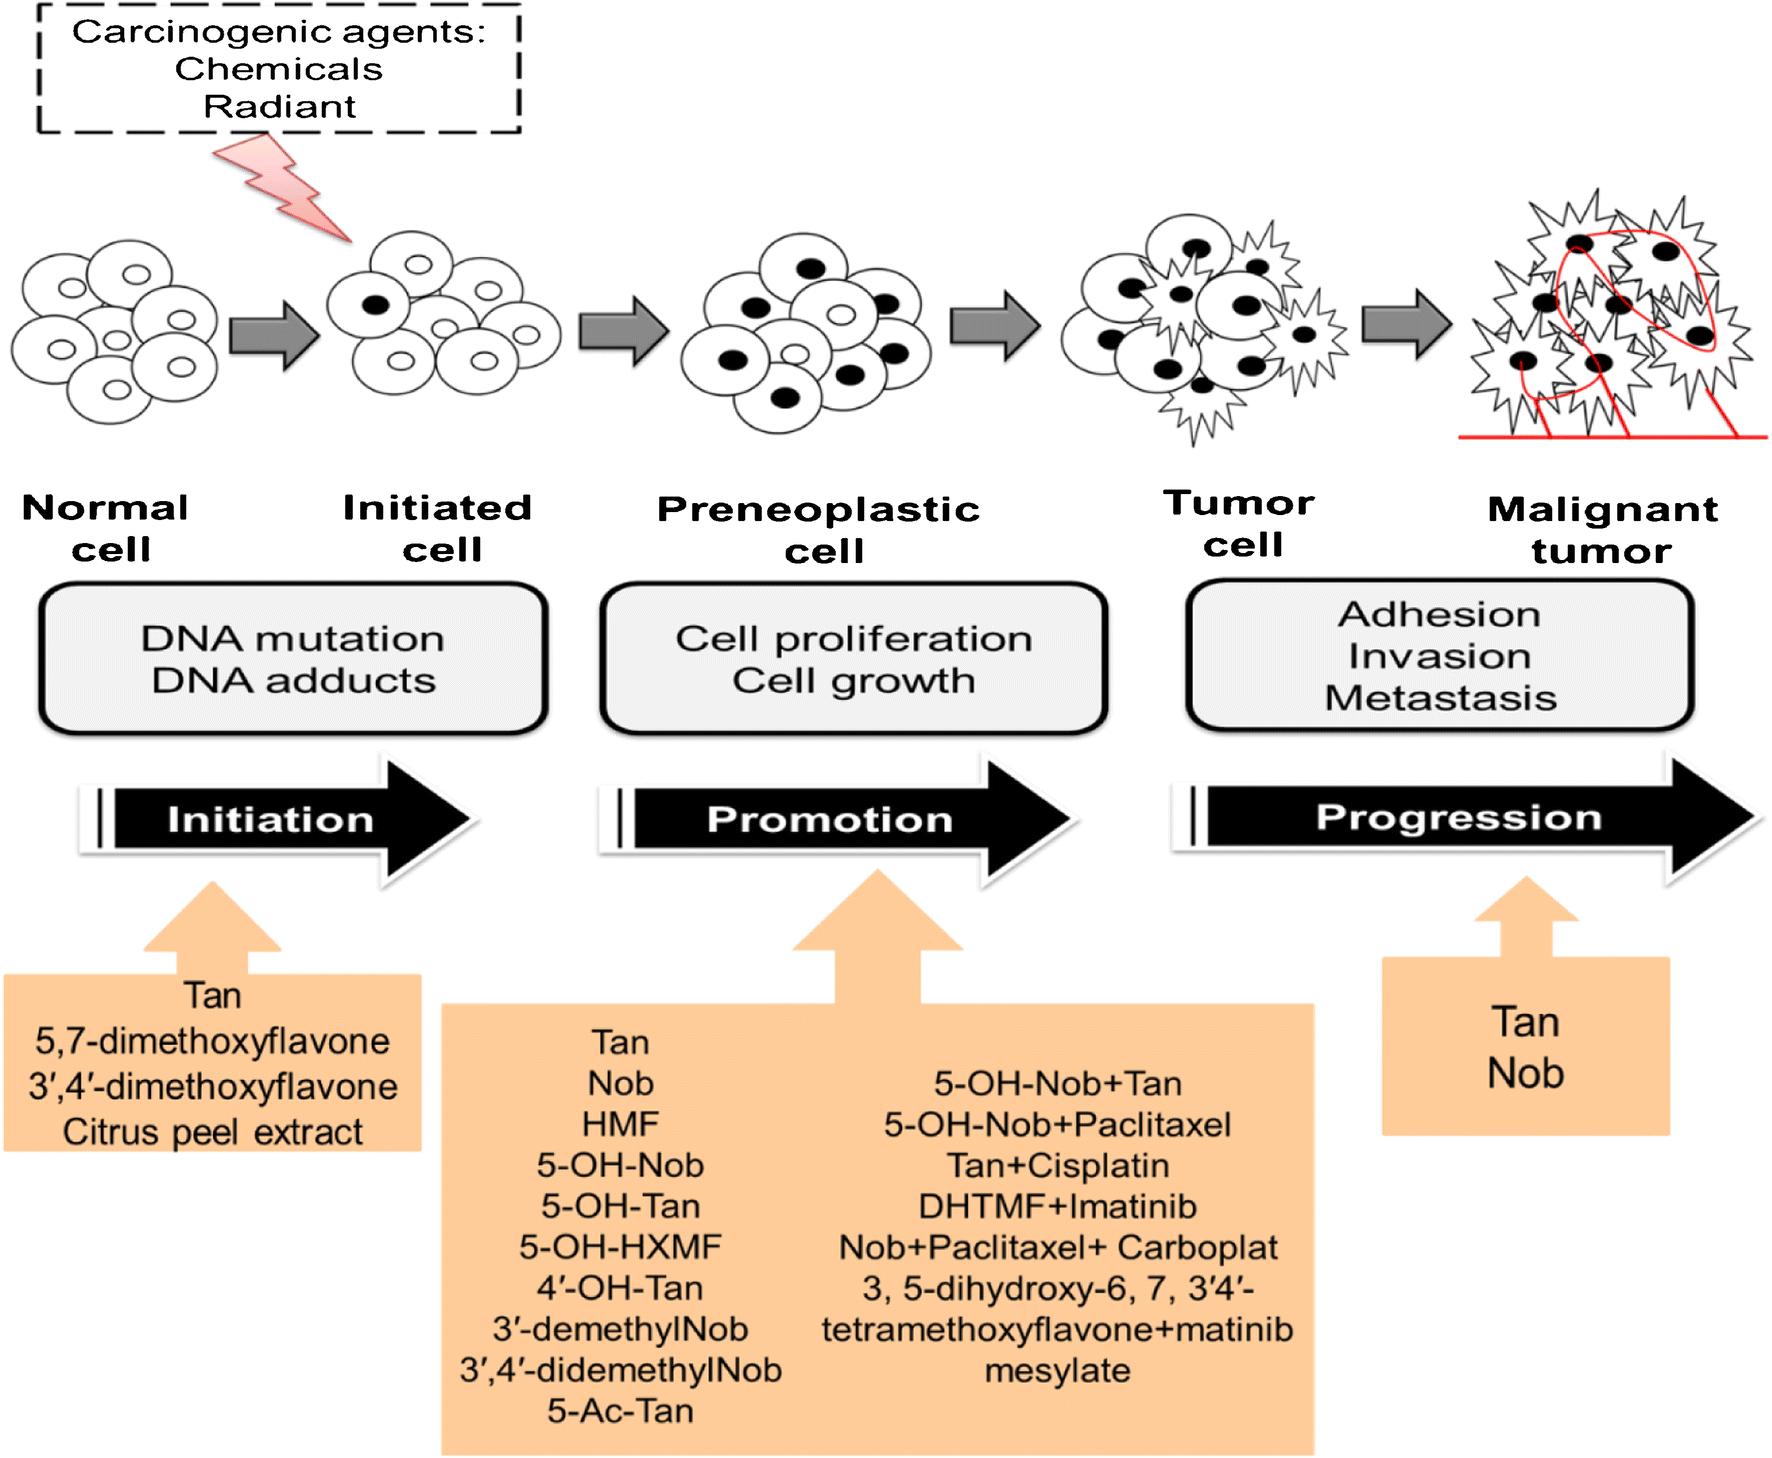 Polymethoxyflavones: Chemistry and Molecular Mechanisms for